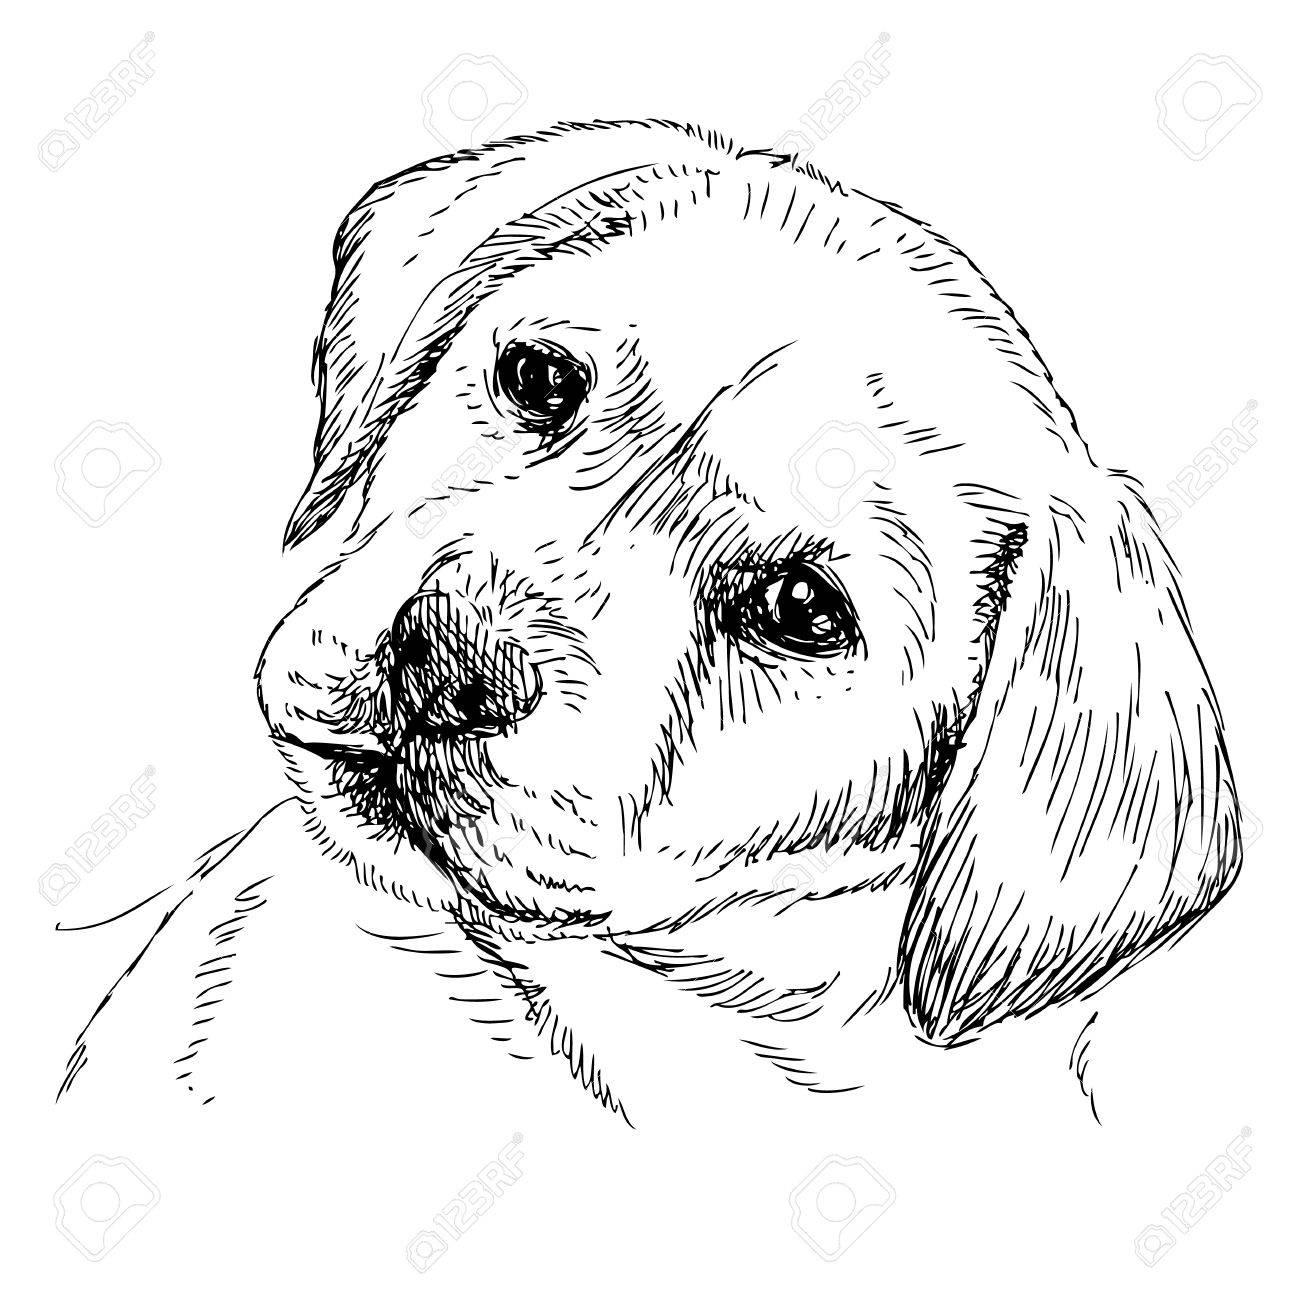 1300x1300 Image Of Labrador Retriever Puppy Hand Drawn Vector Royalty Free